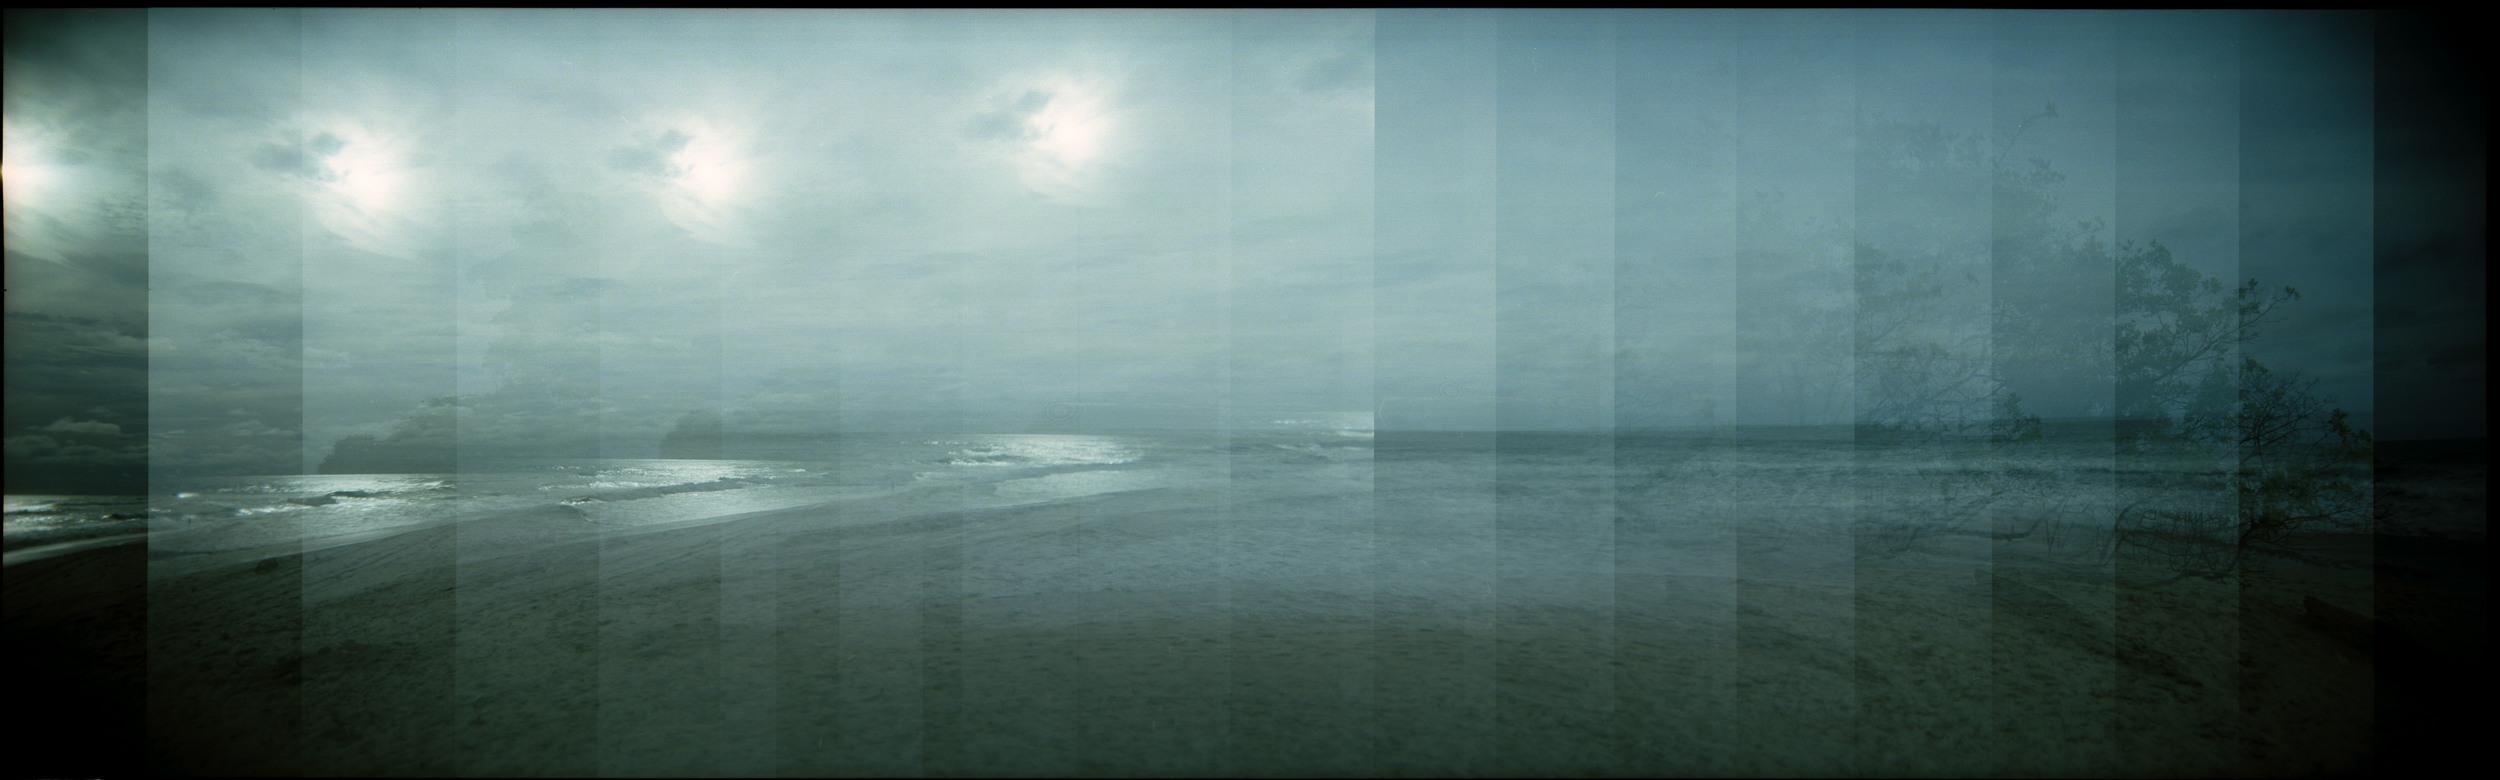 coast pana 2.jpg